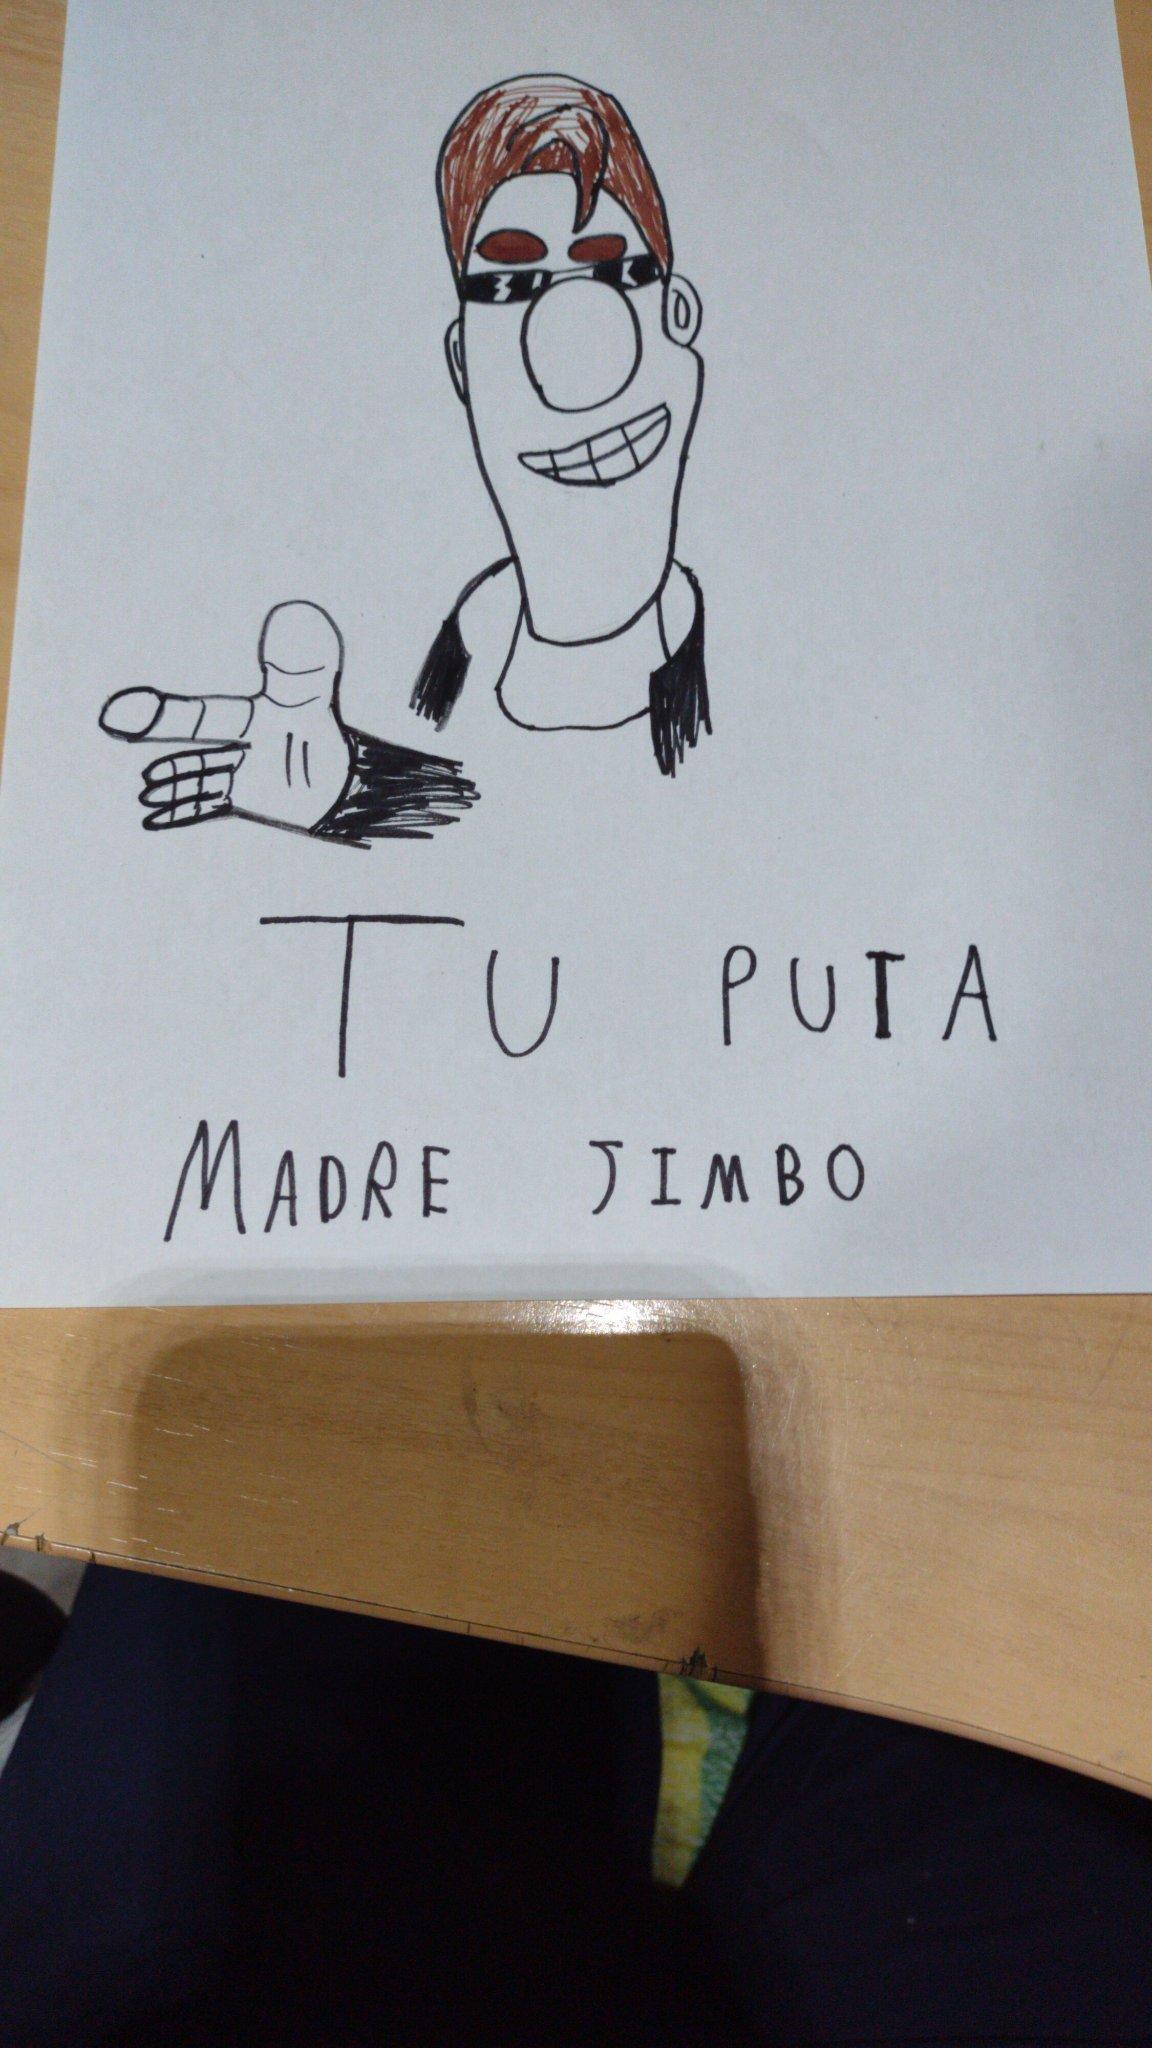 Tuputa madre jimbo - meme